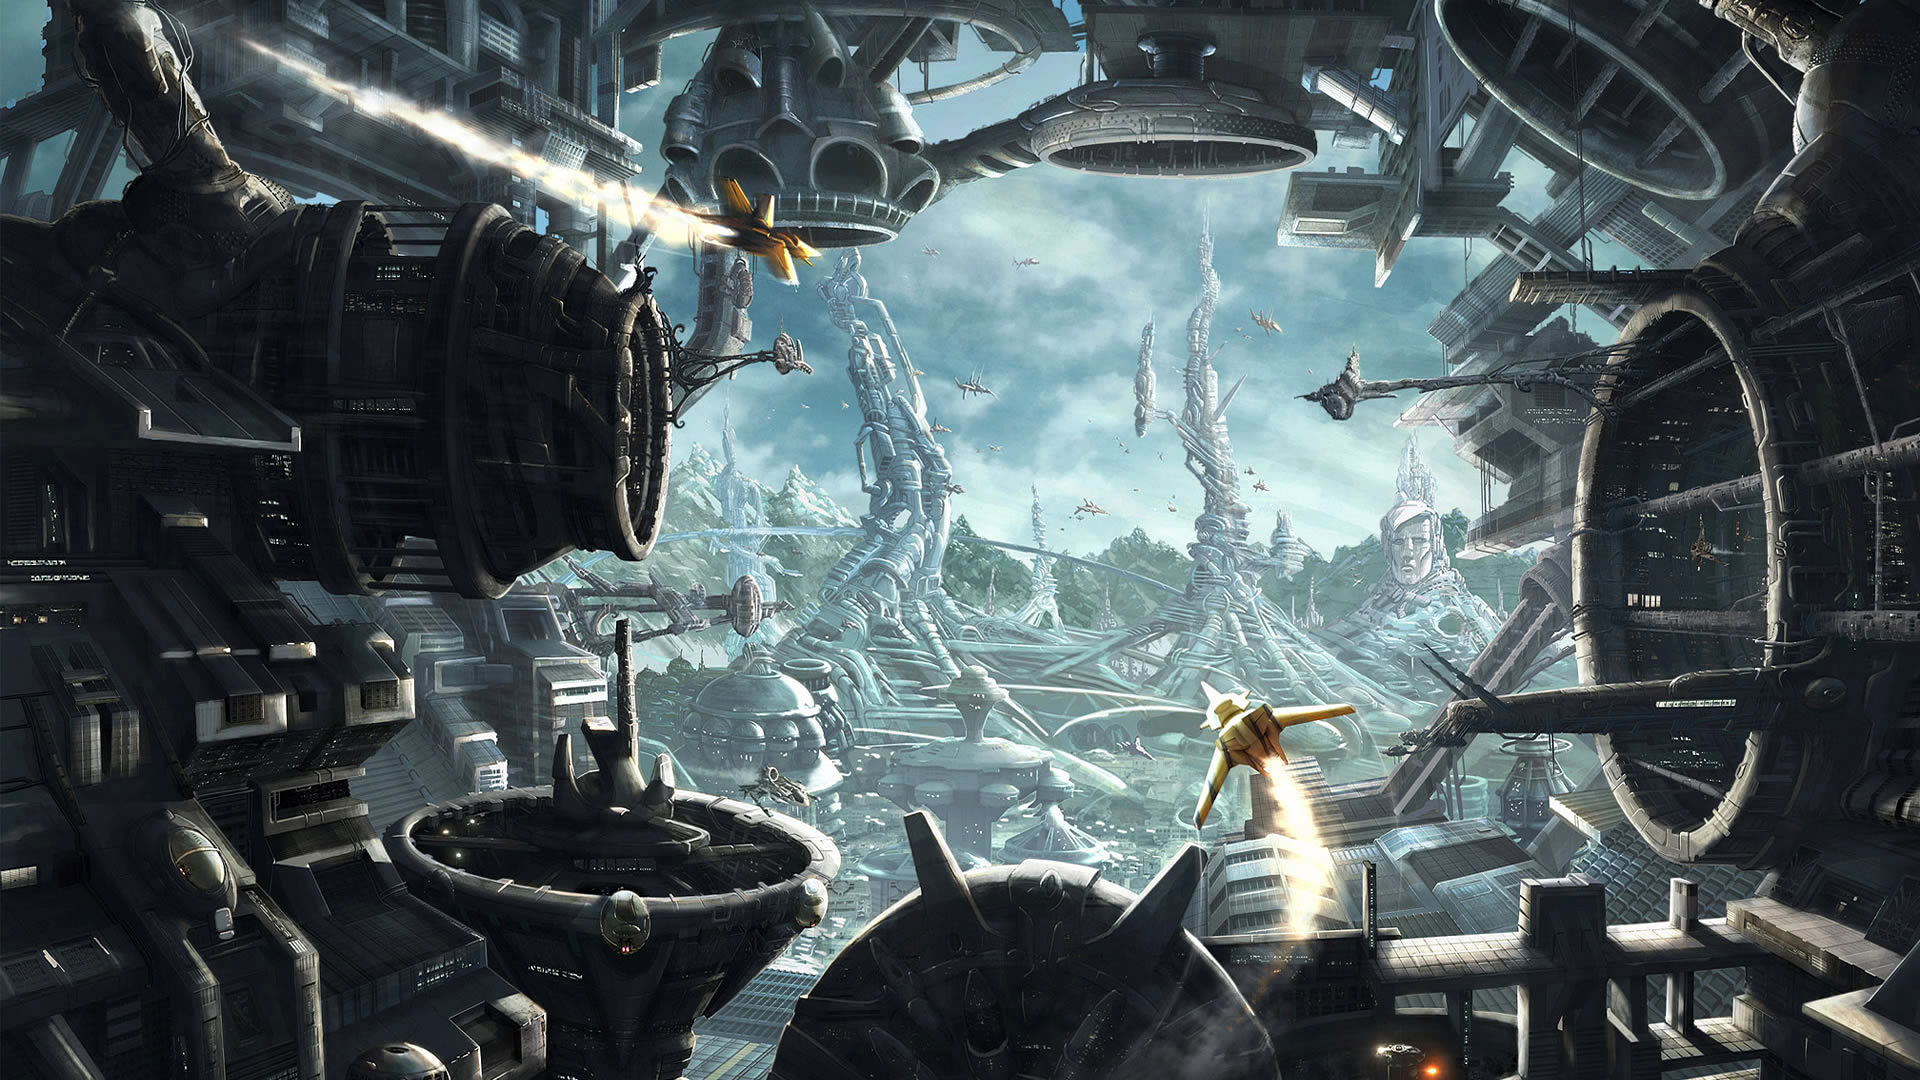 47 Retro Sci Fi Wallpaper On Wallpapersafari